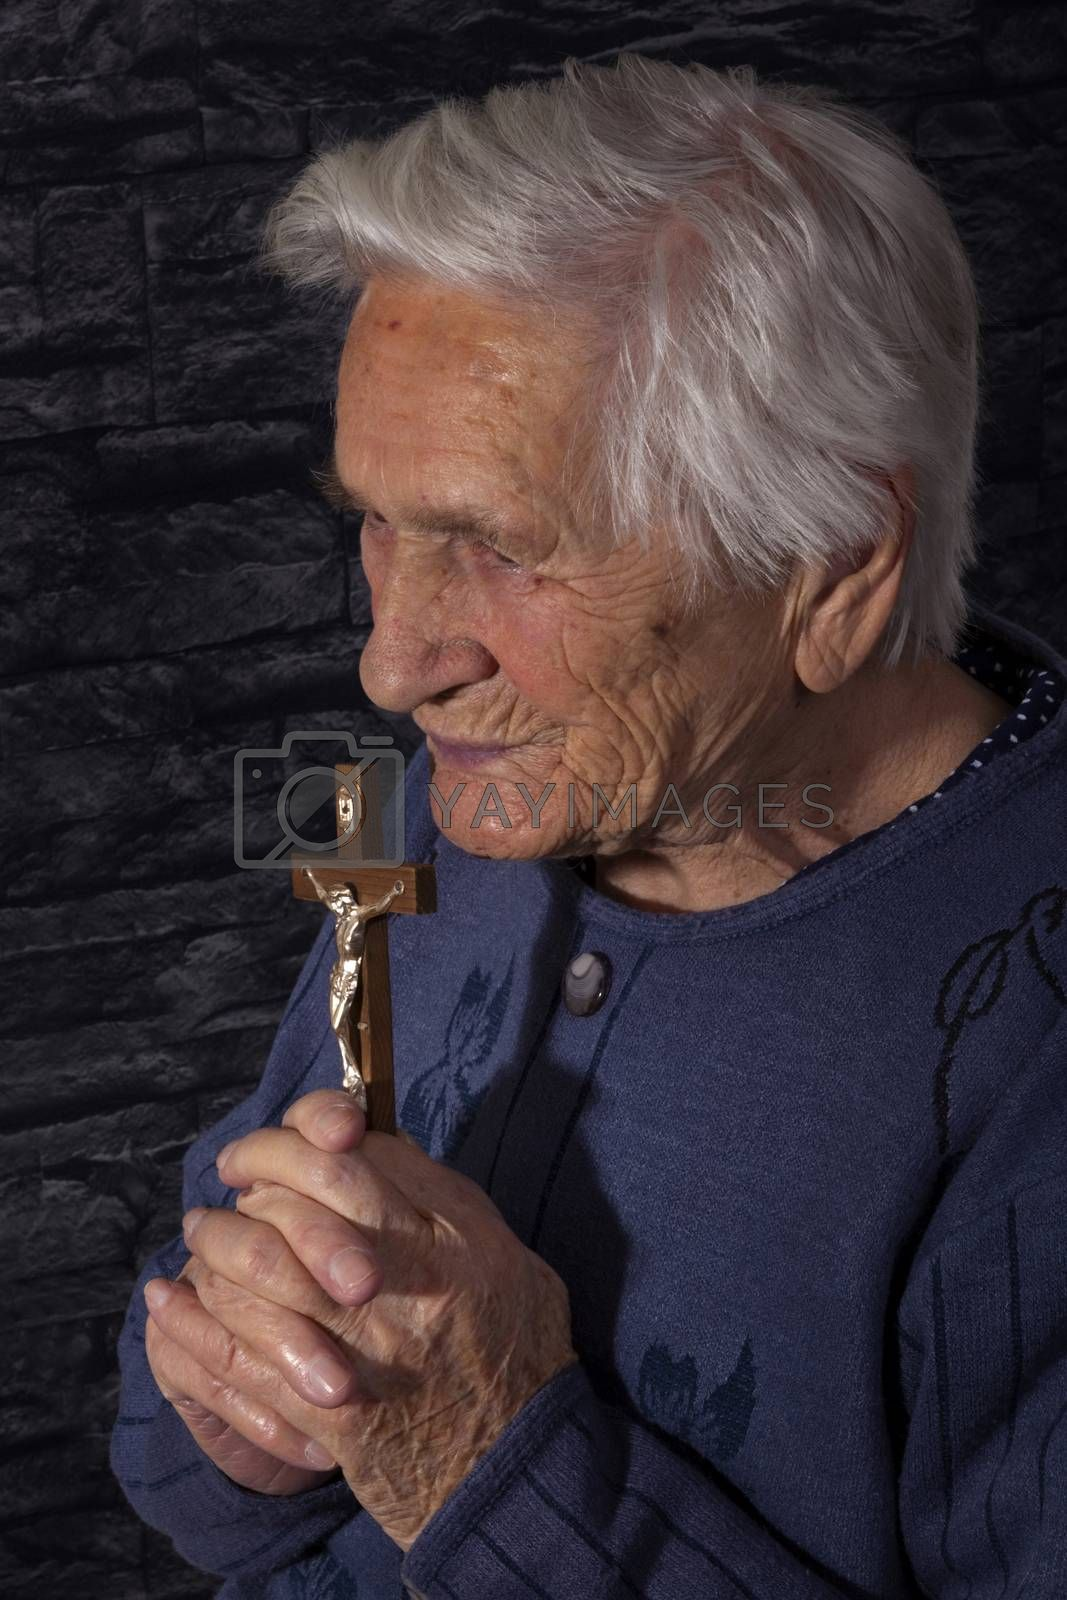 Grandmother praying. by eskymaks